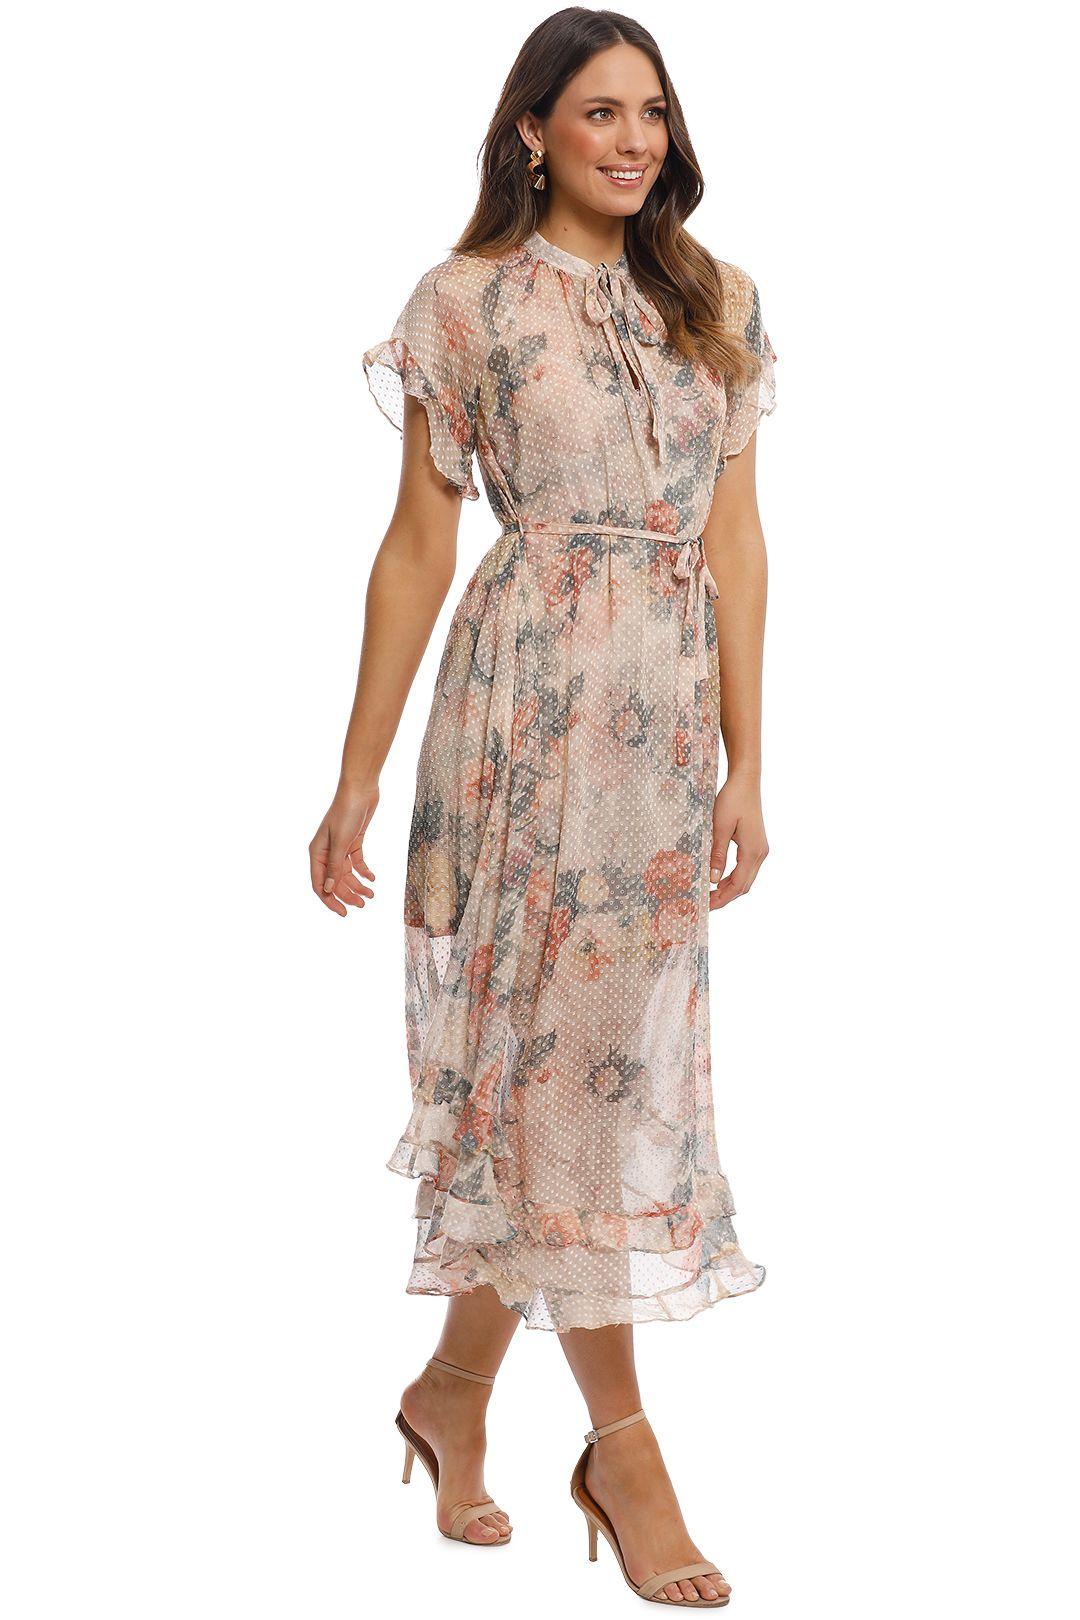 Zimmermann - Radiate Cascade Dress - Cream Floral - Side